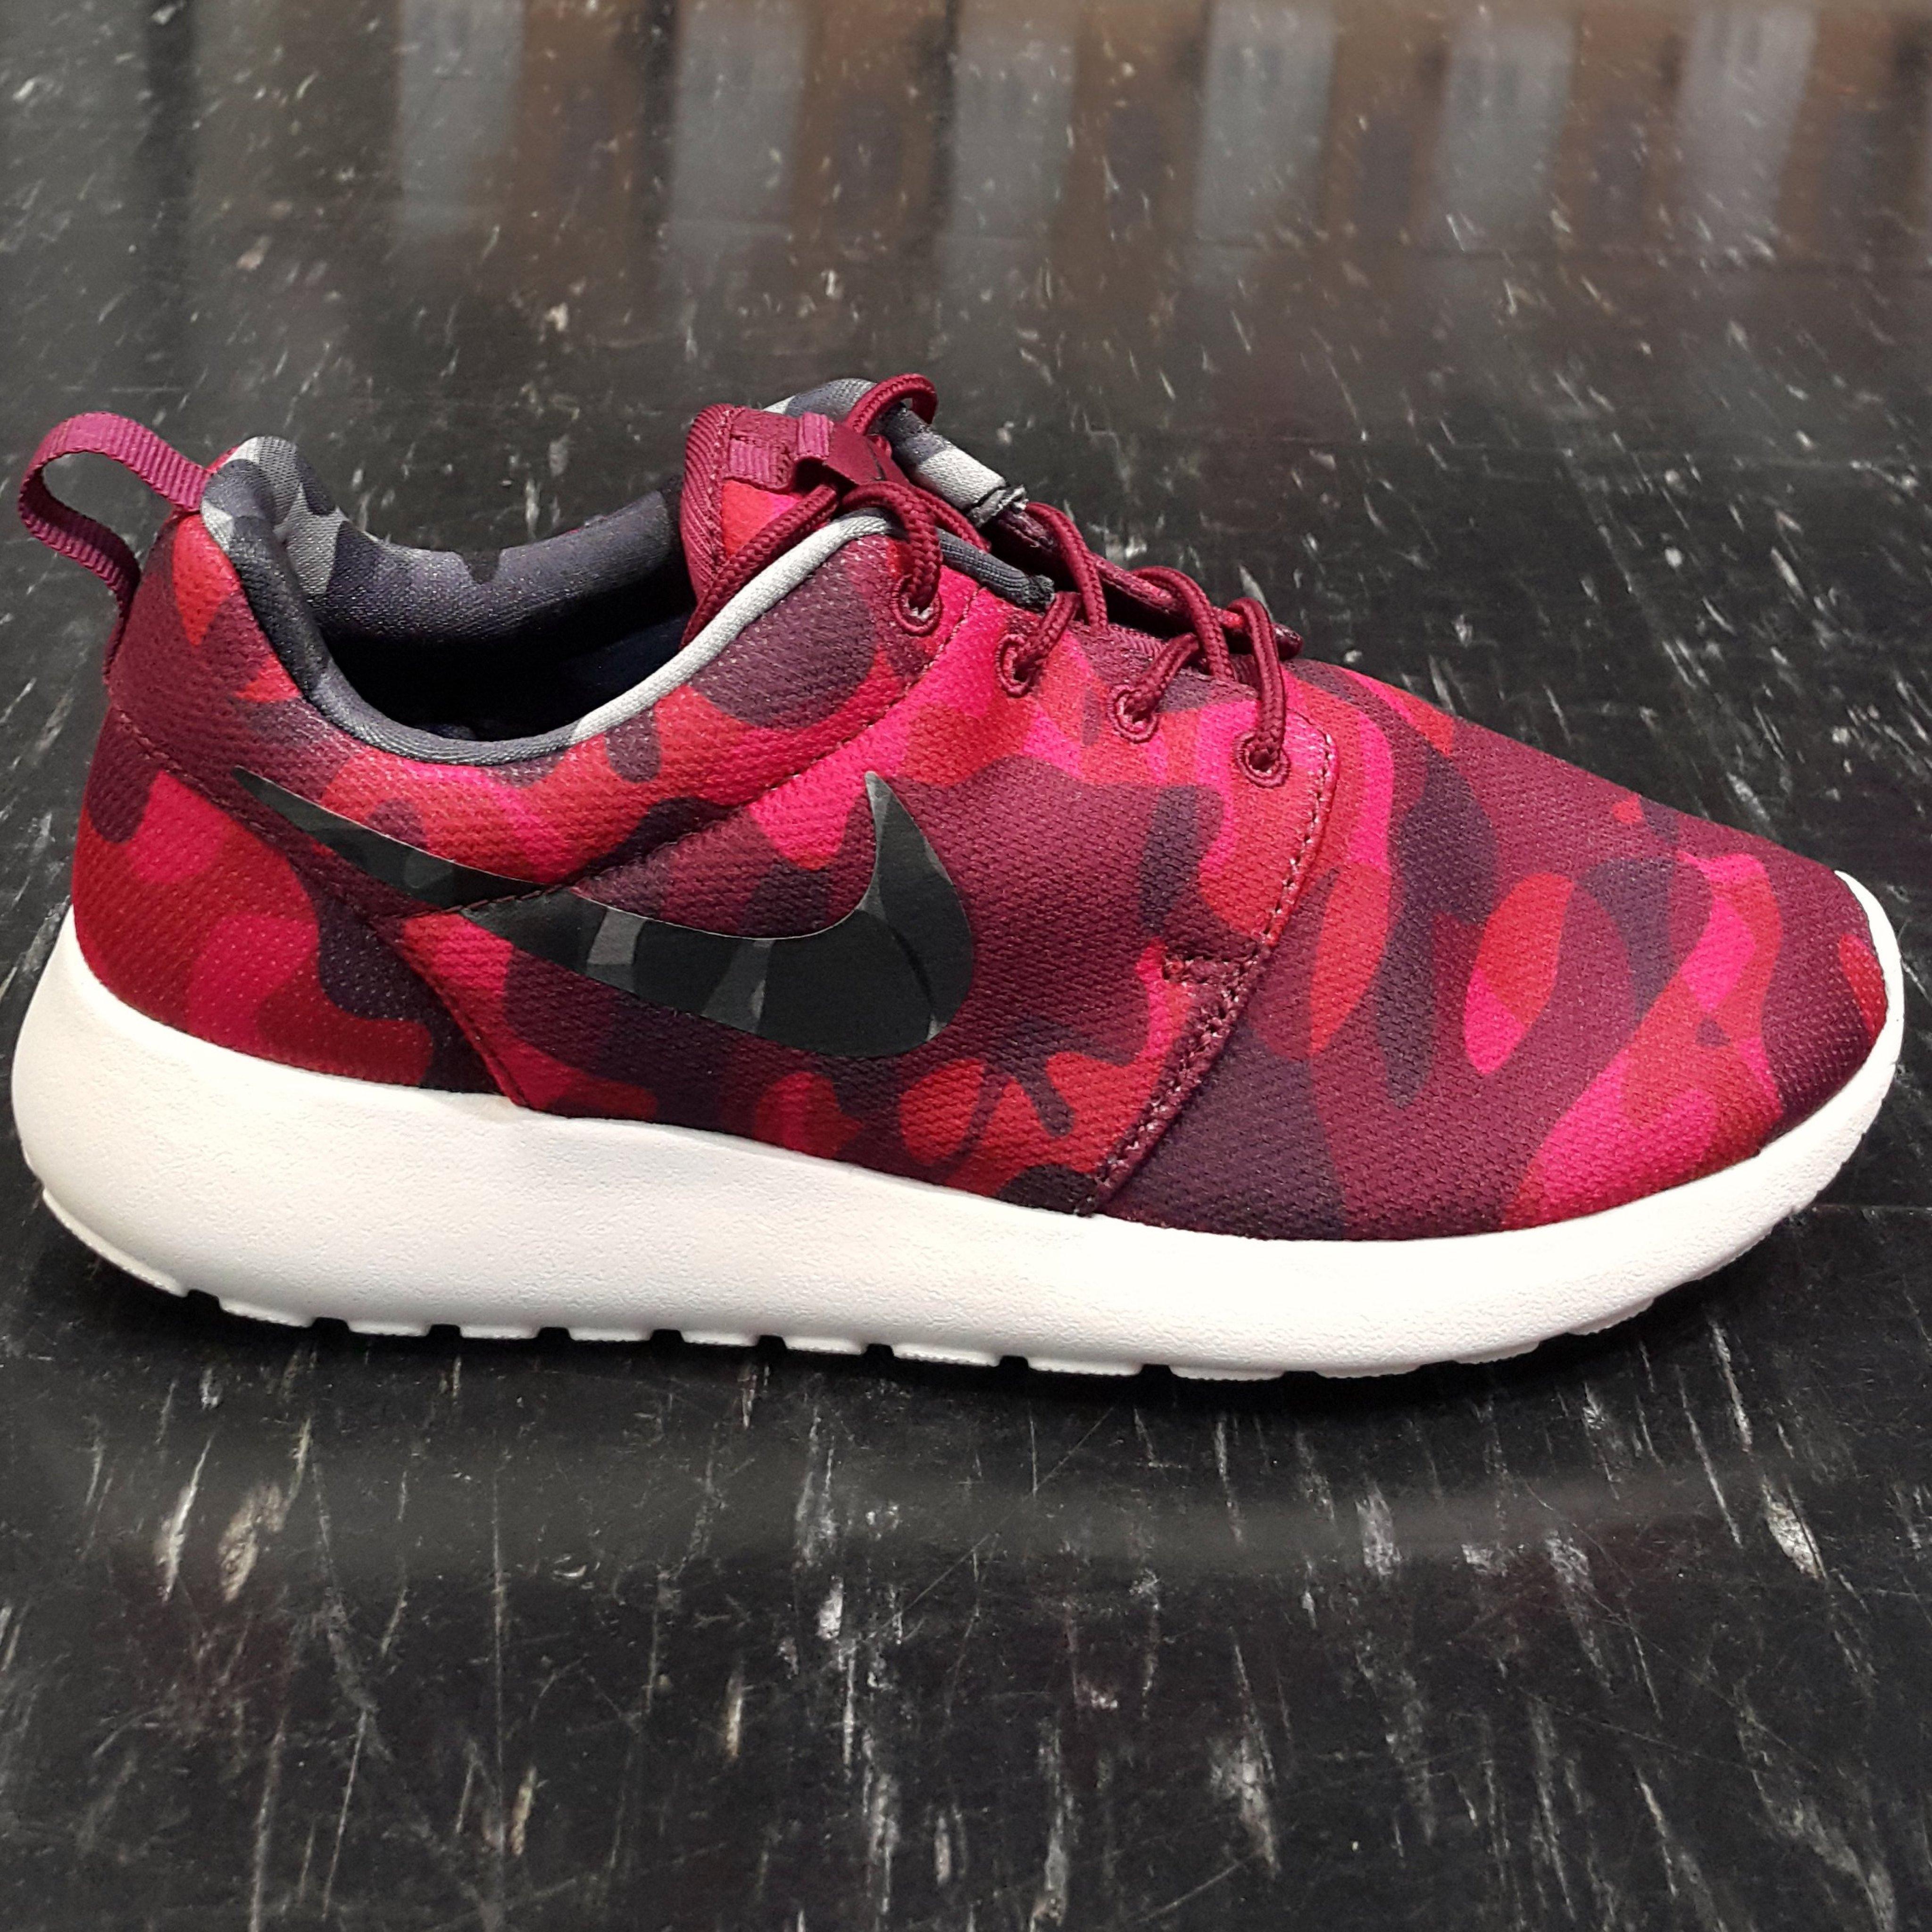 WMNS NIKE ROSHE ONE RUN PRINT 紅色 黑色 白色 迷彩 網布 599432-606 慢跑鞋